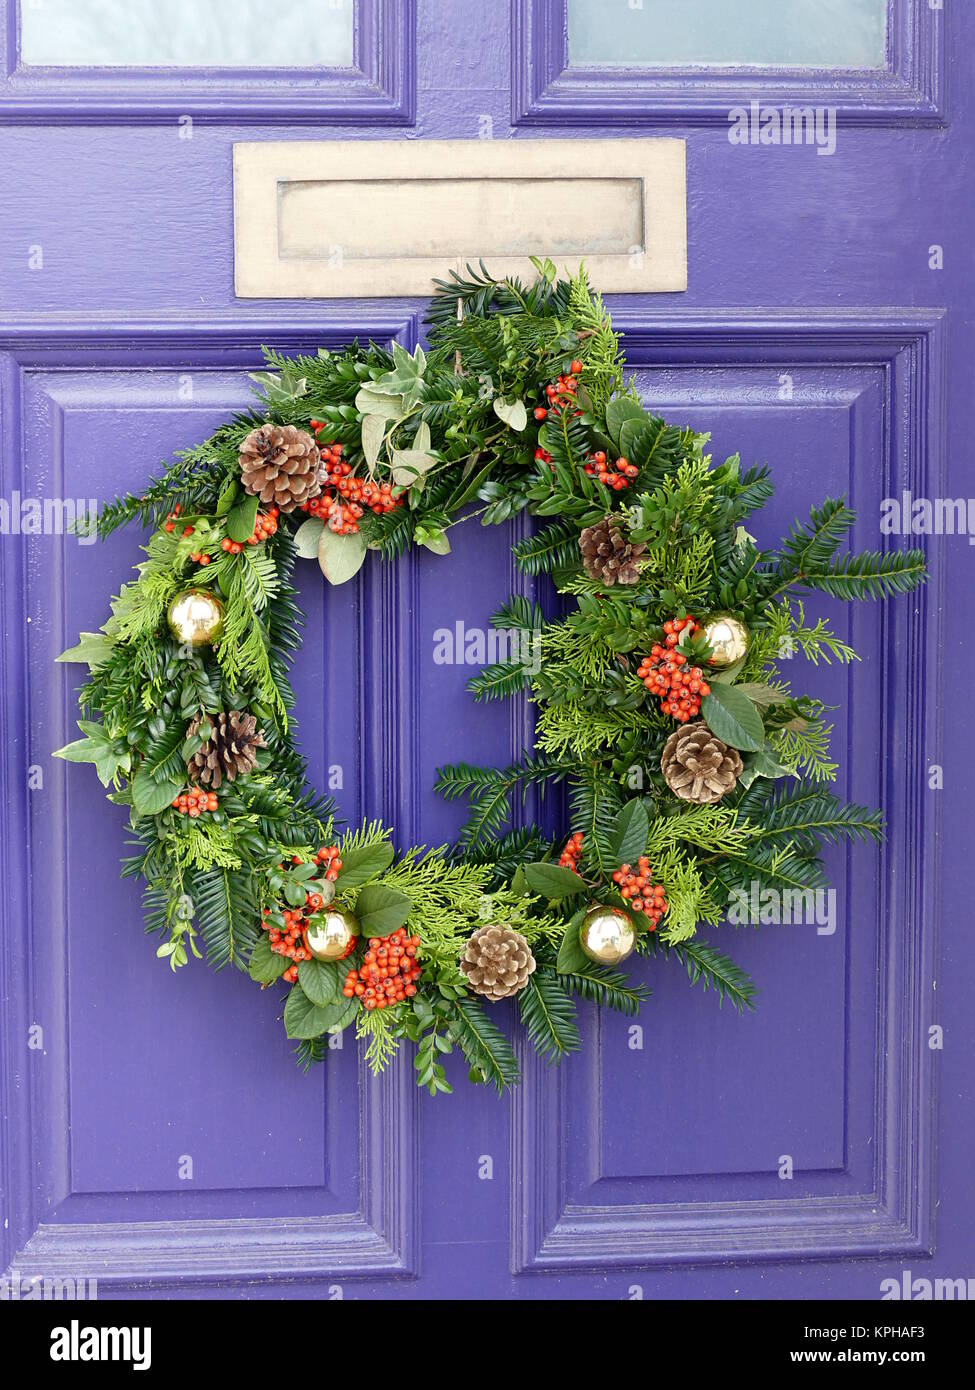 Colourful Wreath On A Purple Door Stock Photo 168797191 Alamy